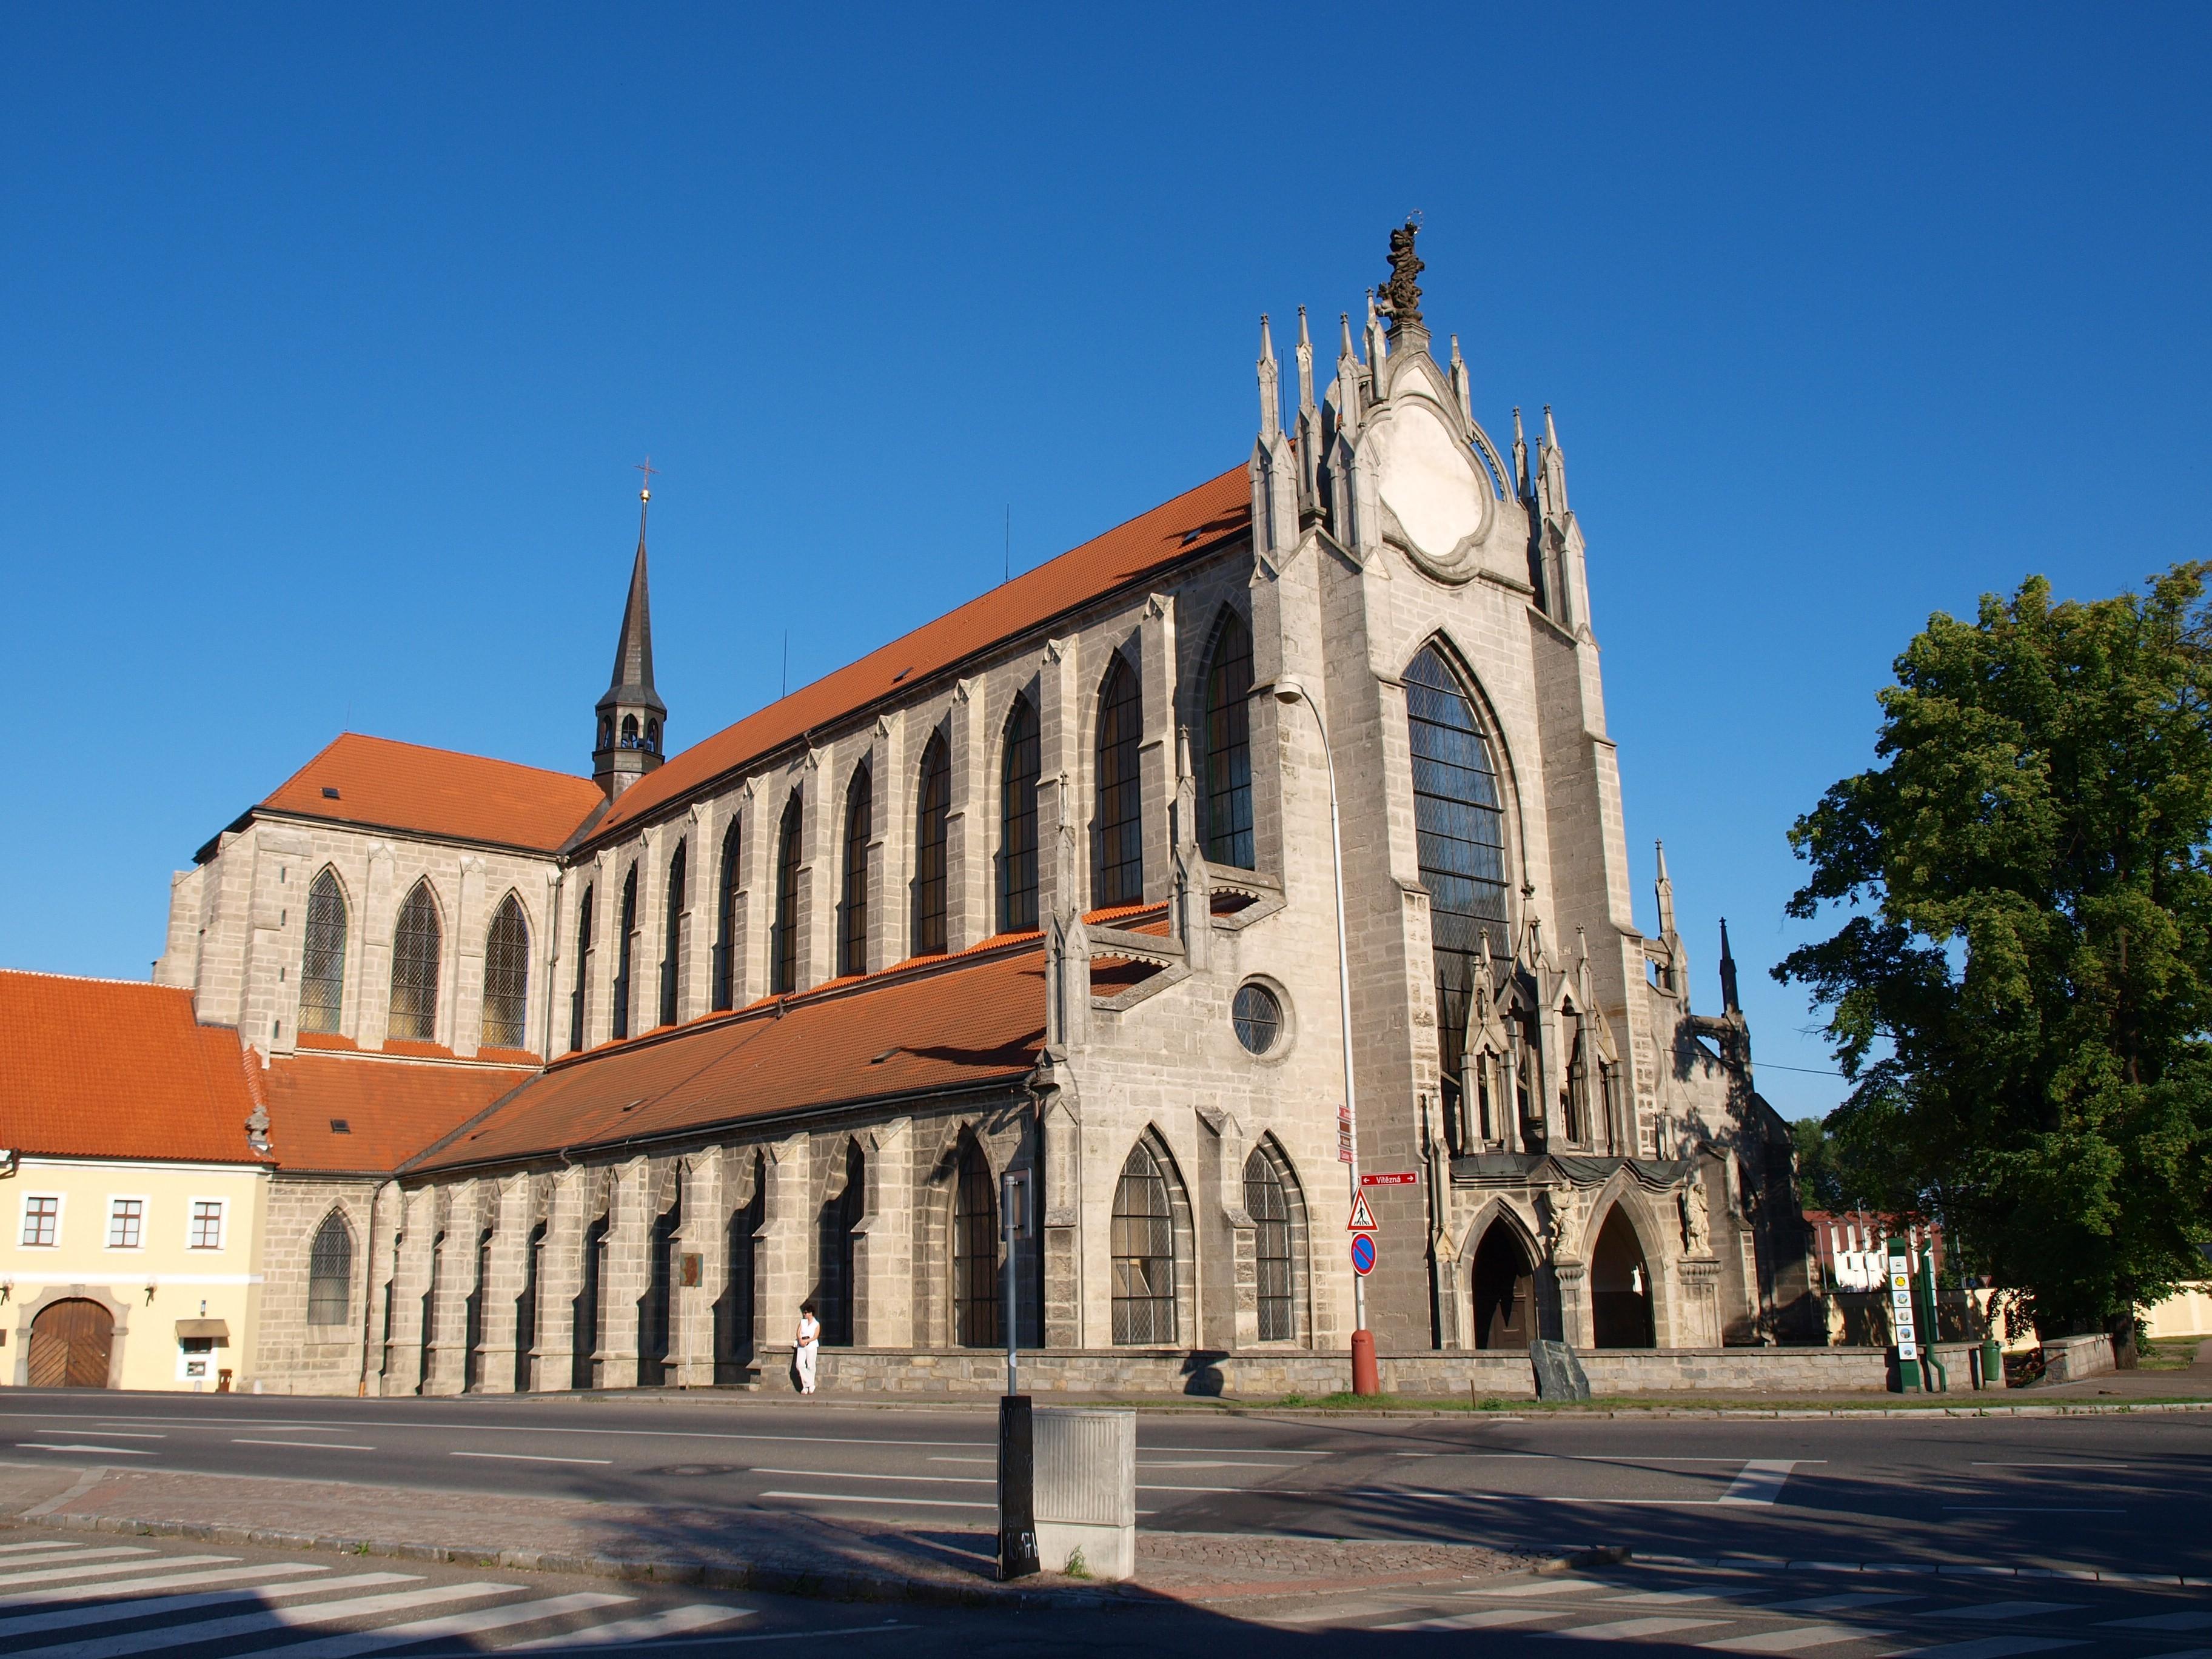 5593-katedrala-nanebevzeti-panny-marie-a-sv-jana-krtitele-cathedral-of-assumption-of-our-lady-and-st-john-the-baptist-2.jpg